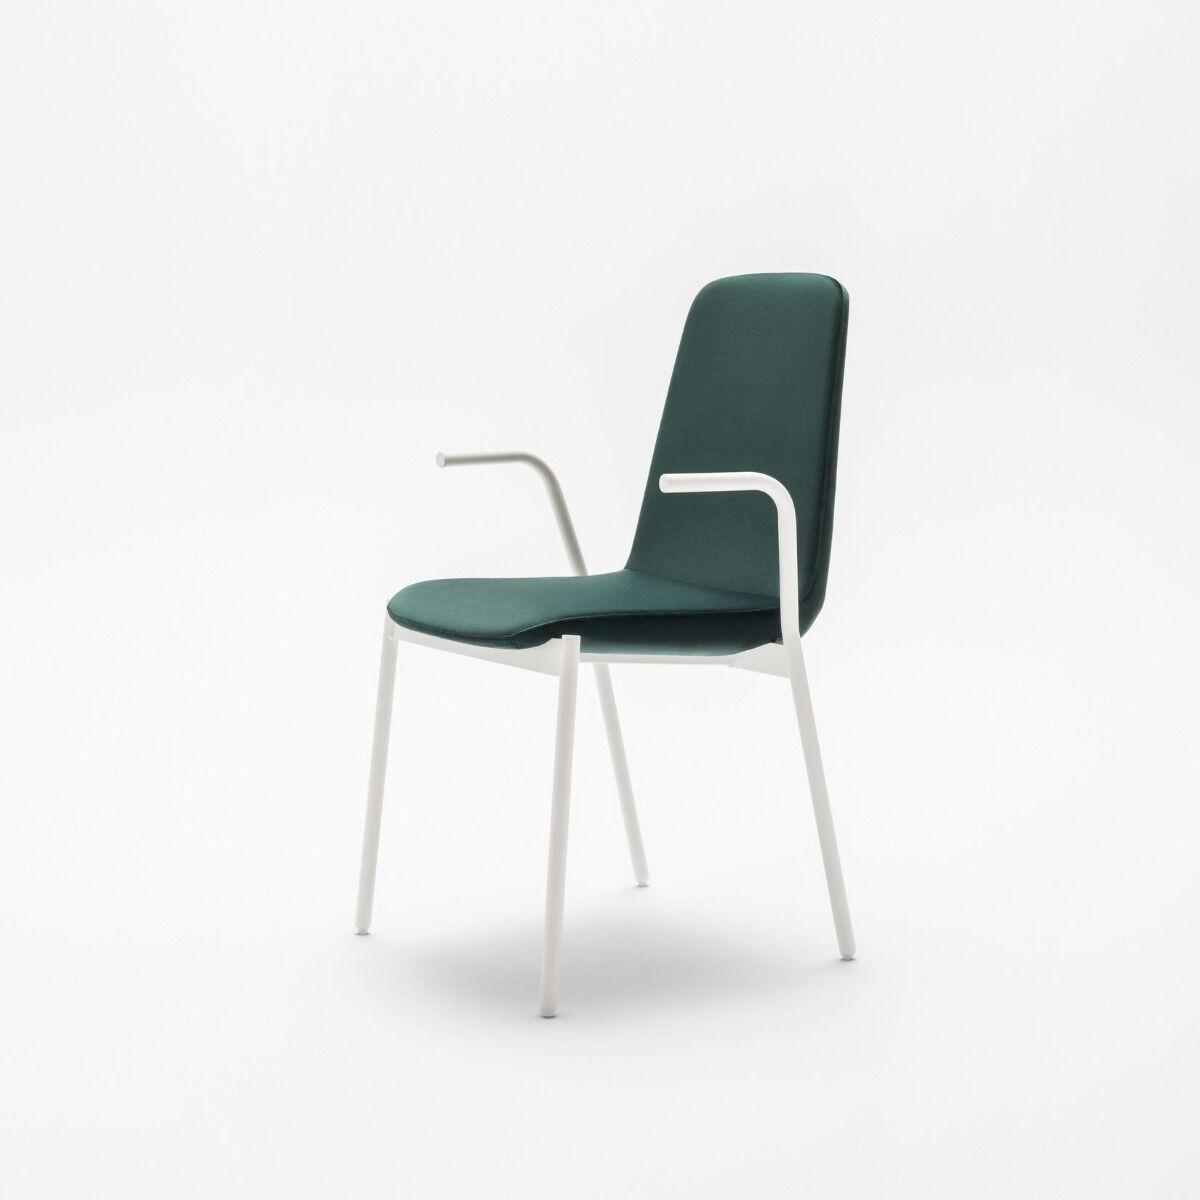 Ulti chair Fabric: Xtreme Colour:  Xr430  Base colour:  M015